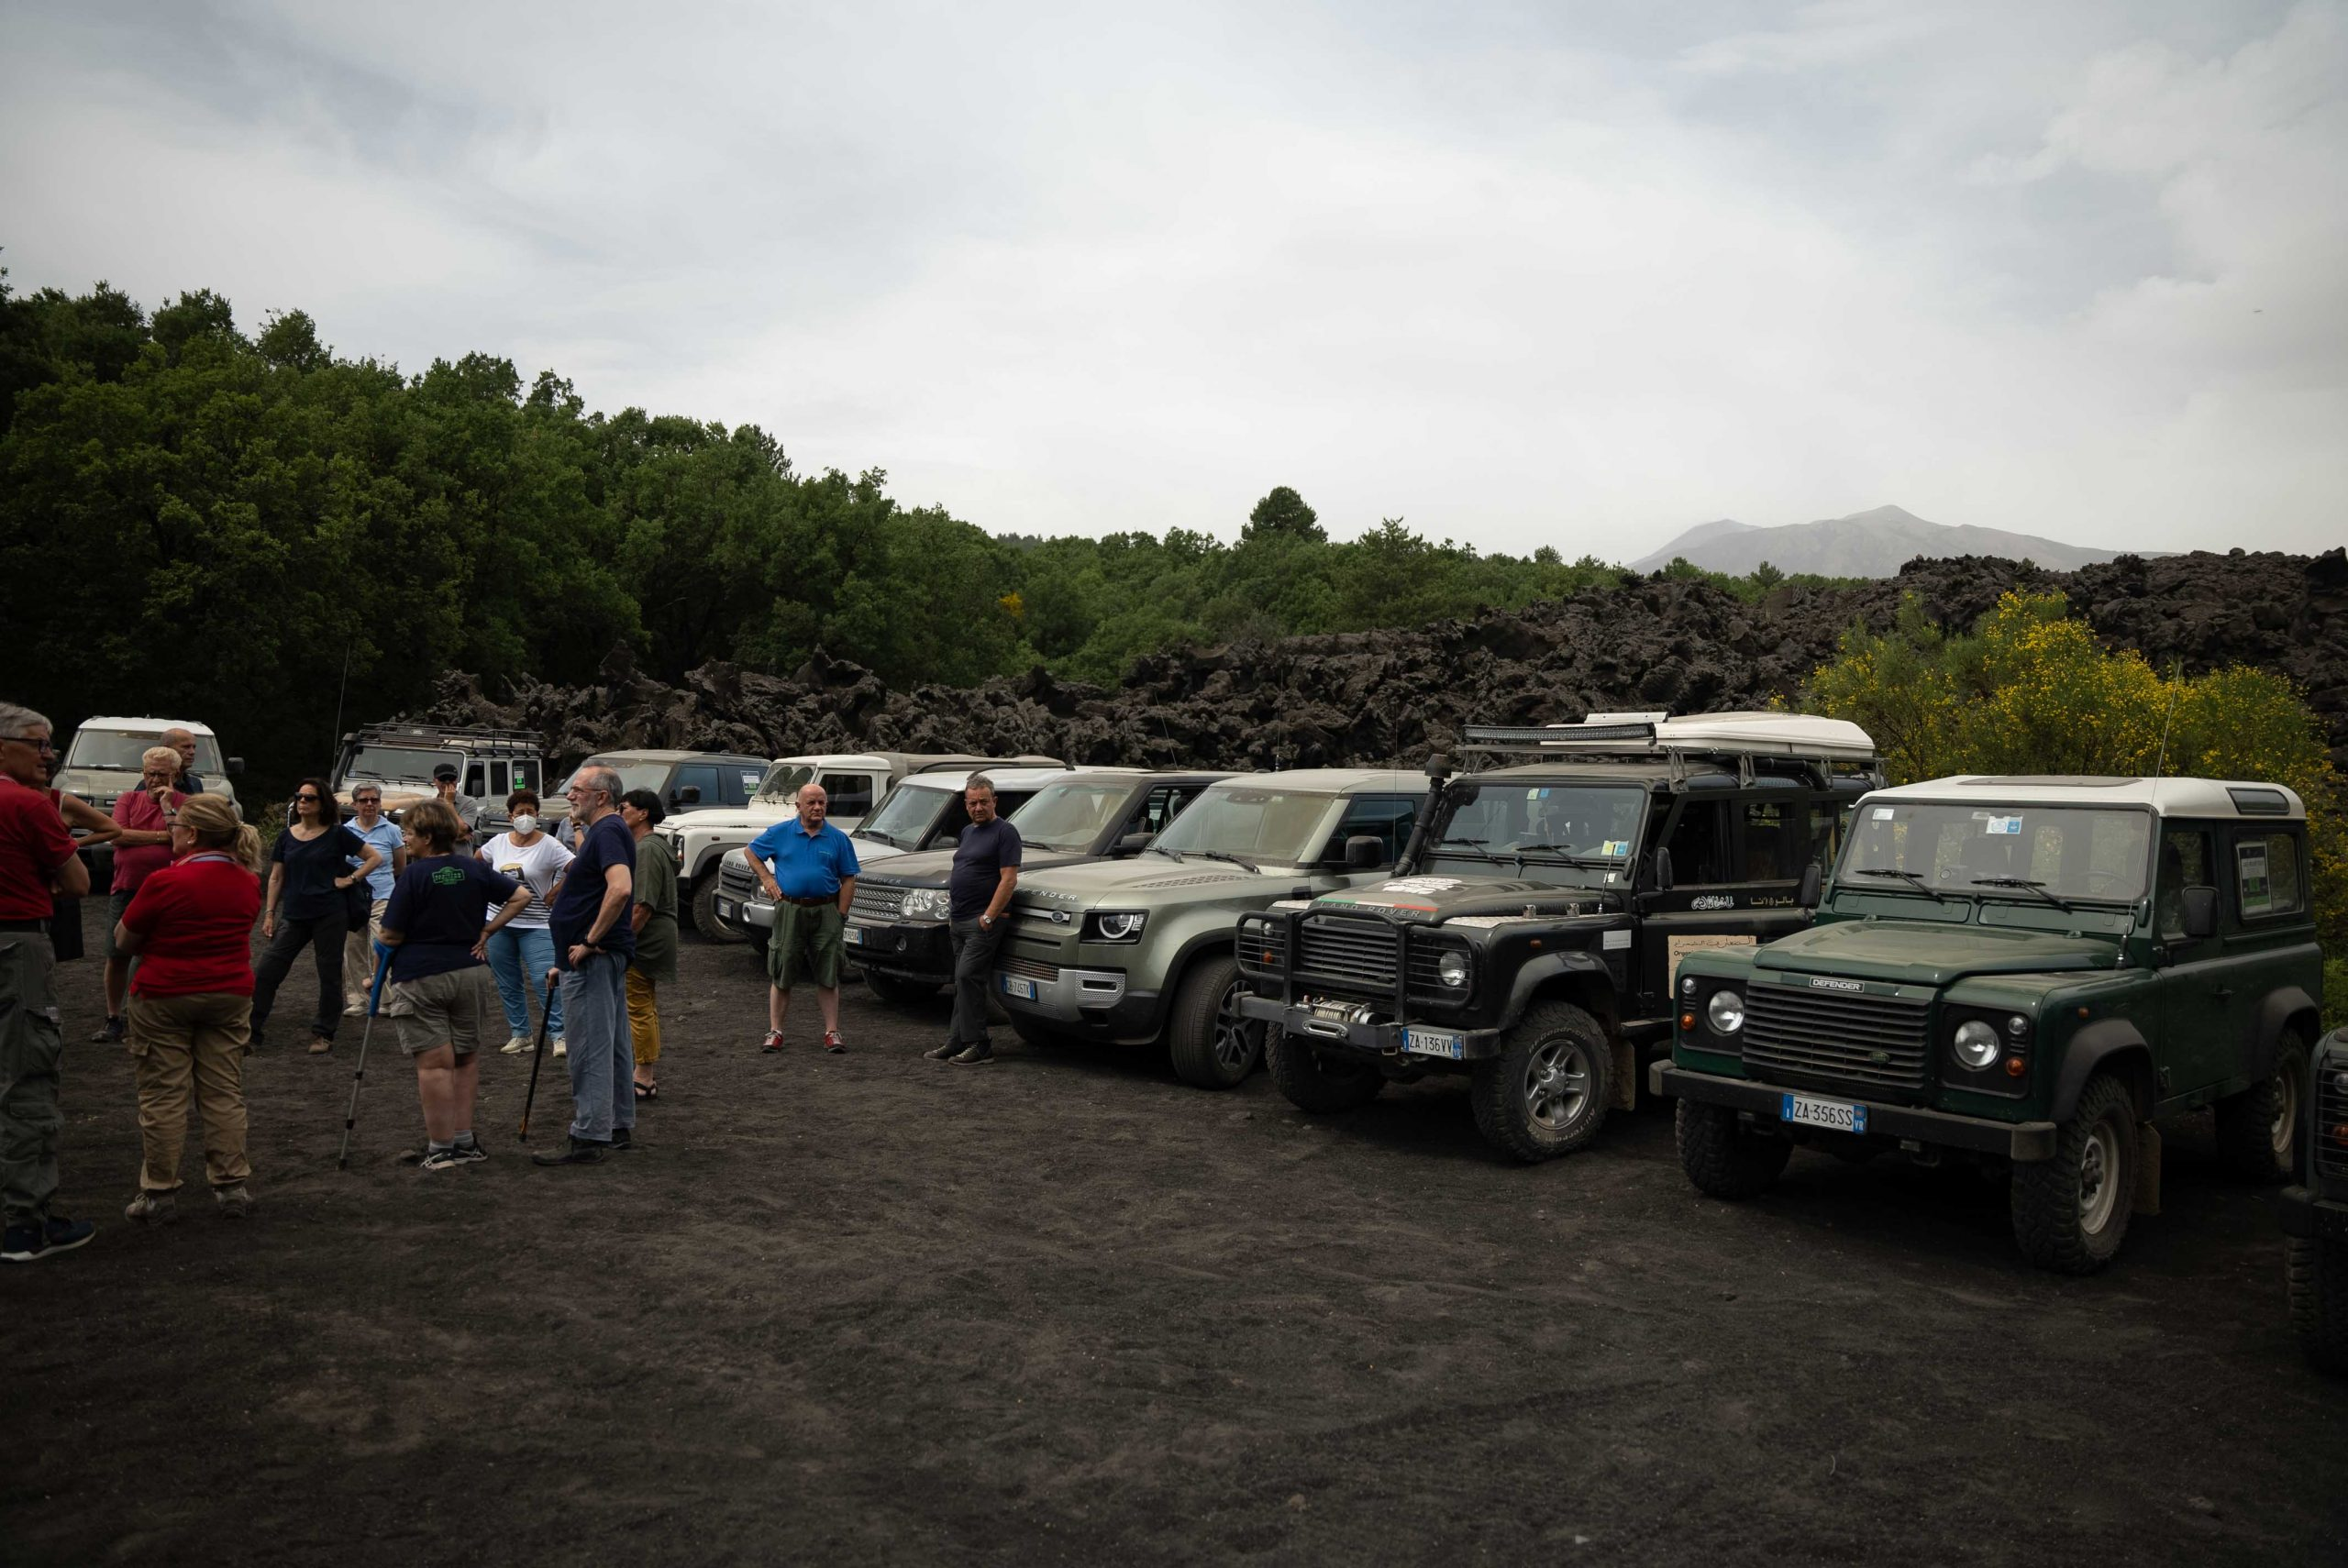 Land_Rover_Tour_Sicilia_2021_Land_Rover_Experience_Italia_-101